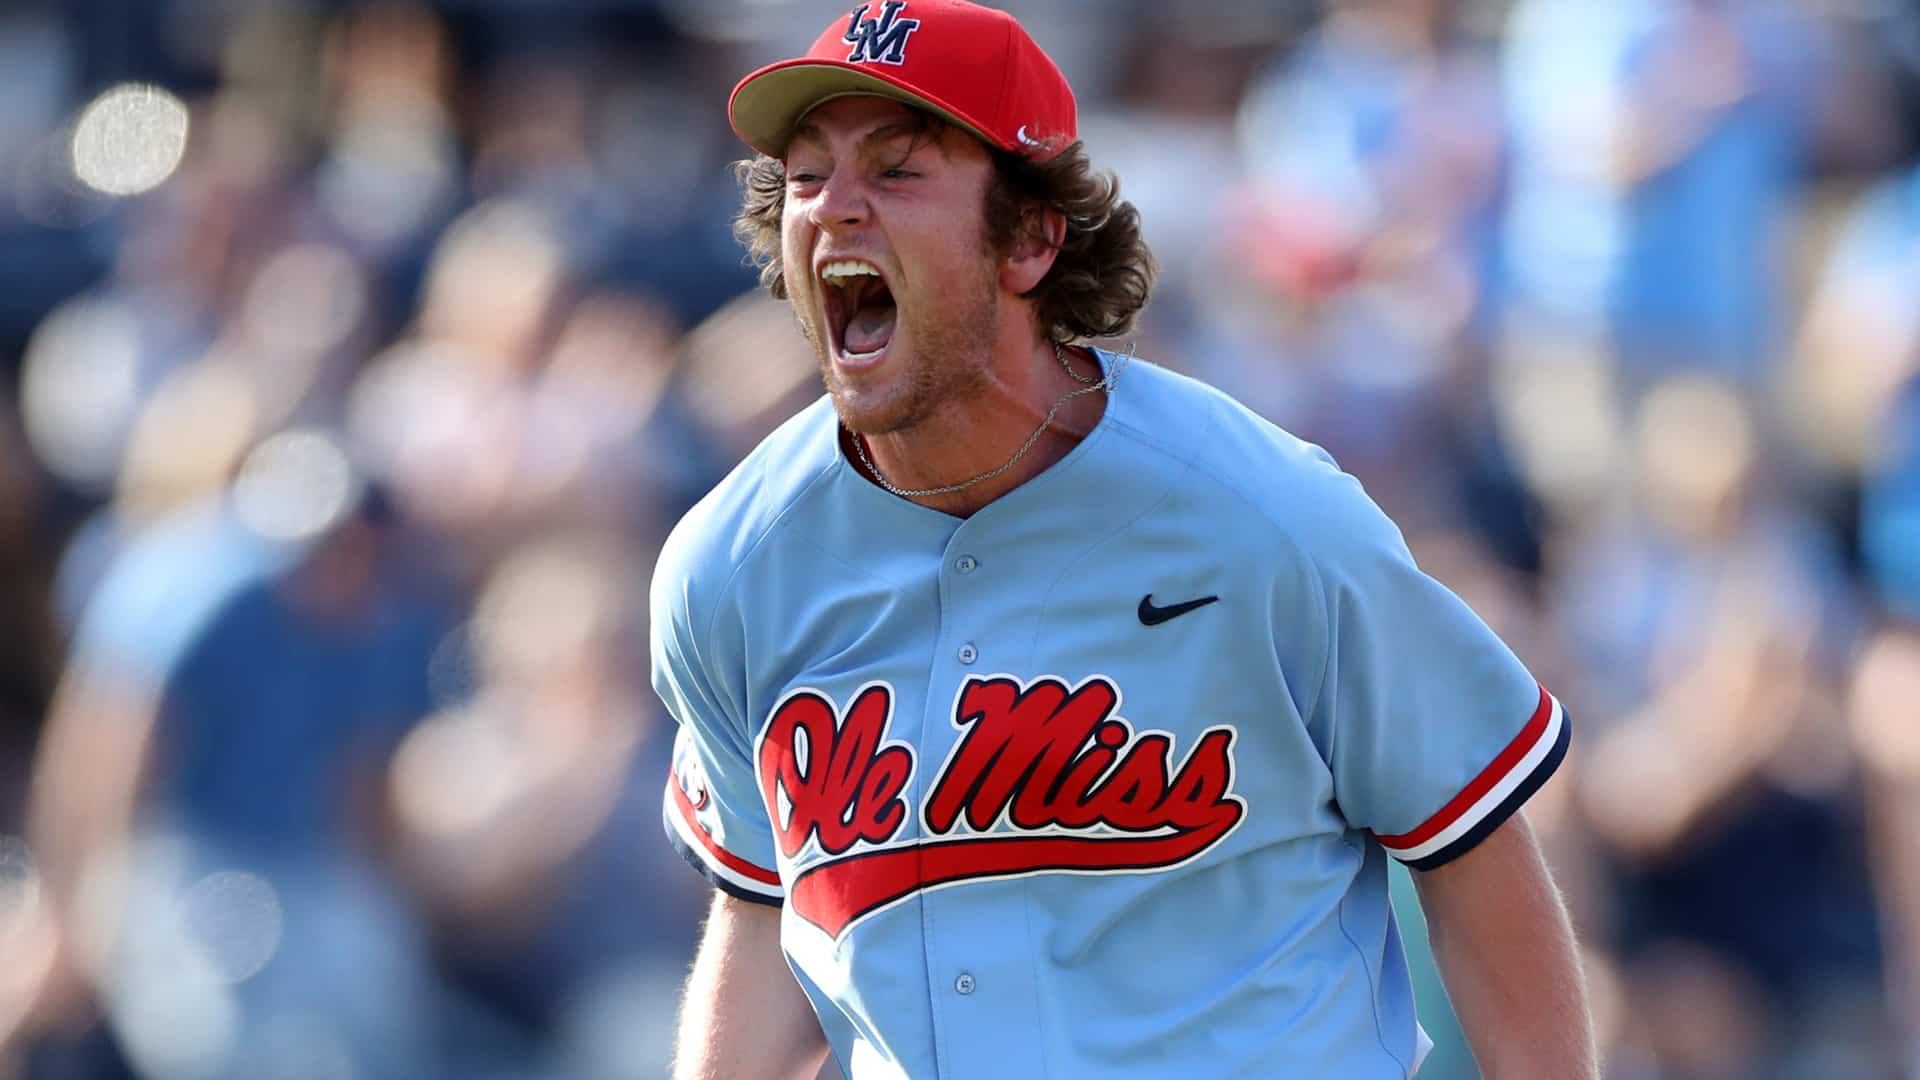 The Season: Ole Miss Baseball – Relentless (2021)